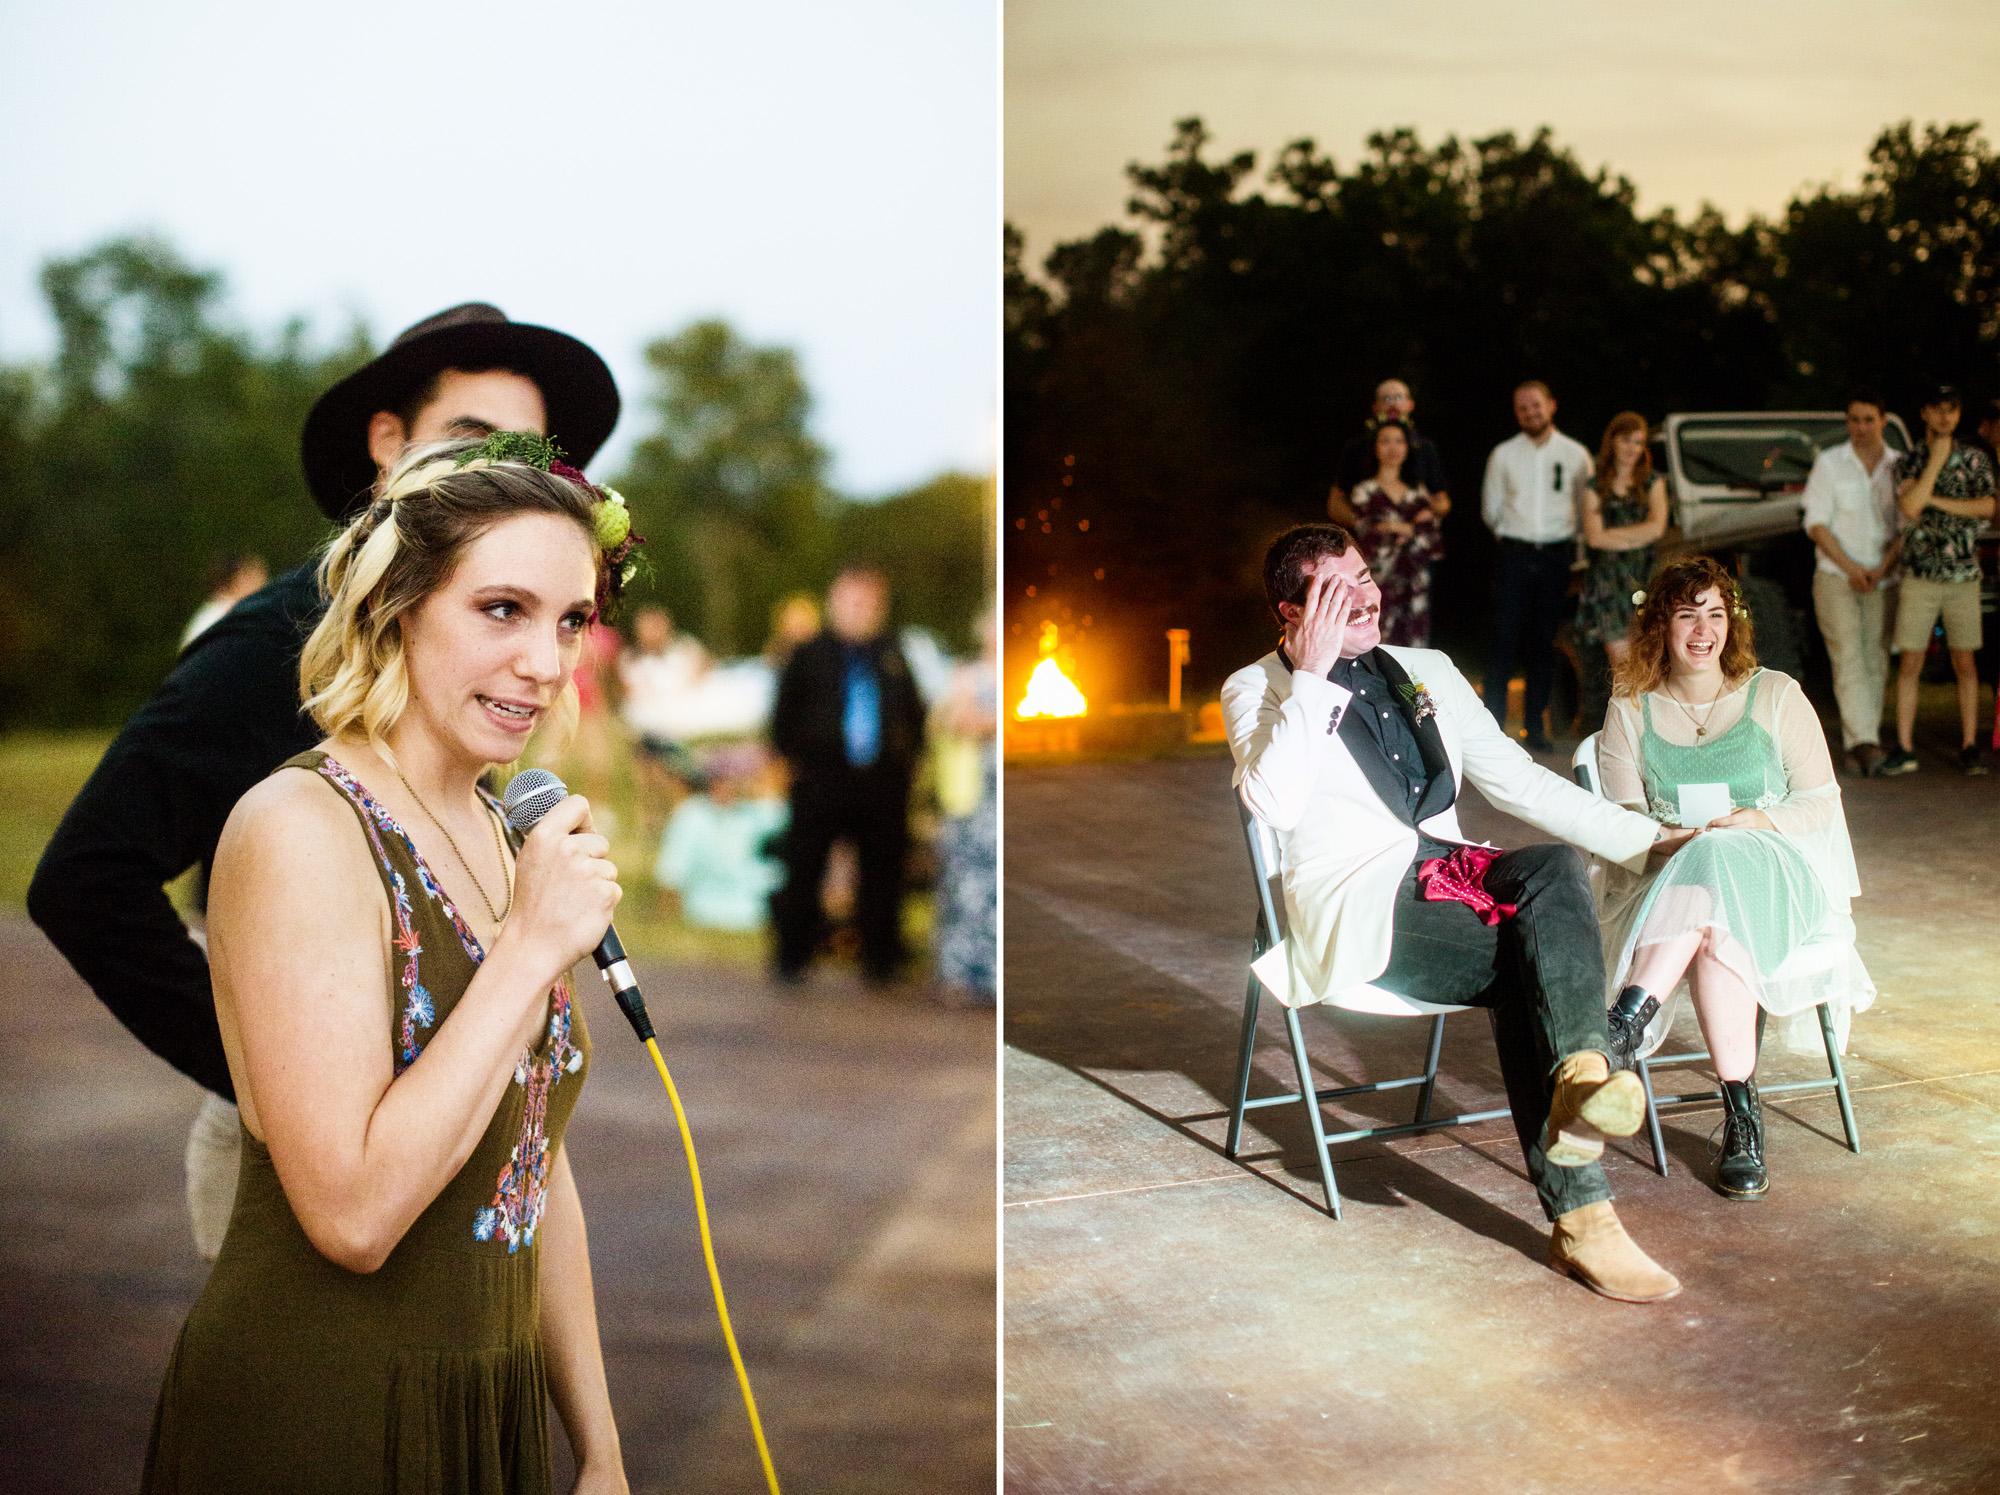 Seriously_Sabrina_Photography_Red_River_Gorge_Kentucky_Wedding_ShawnDana203.jpg